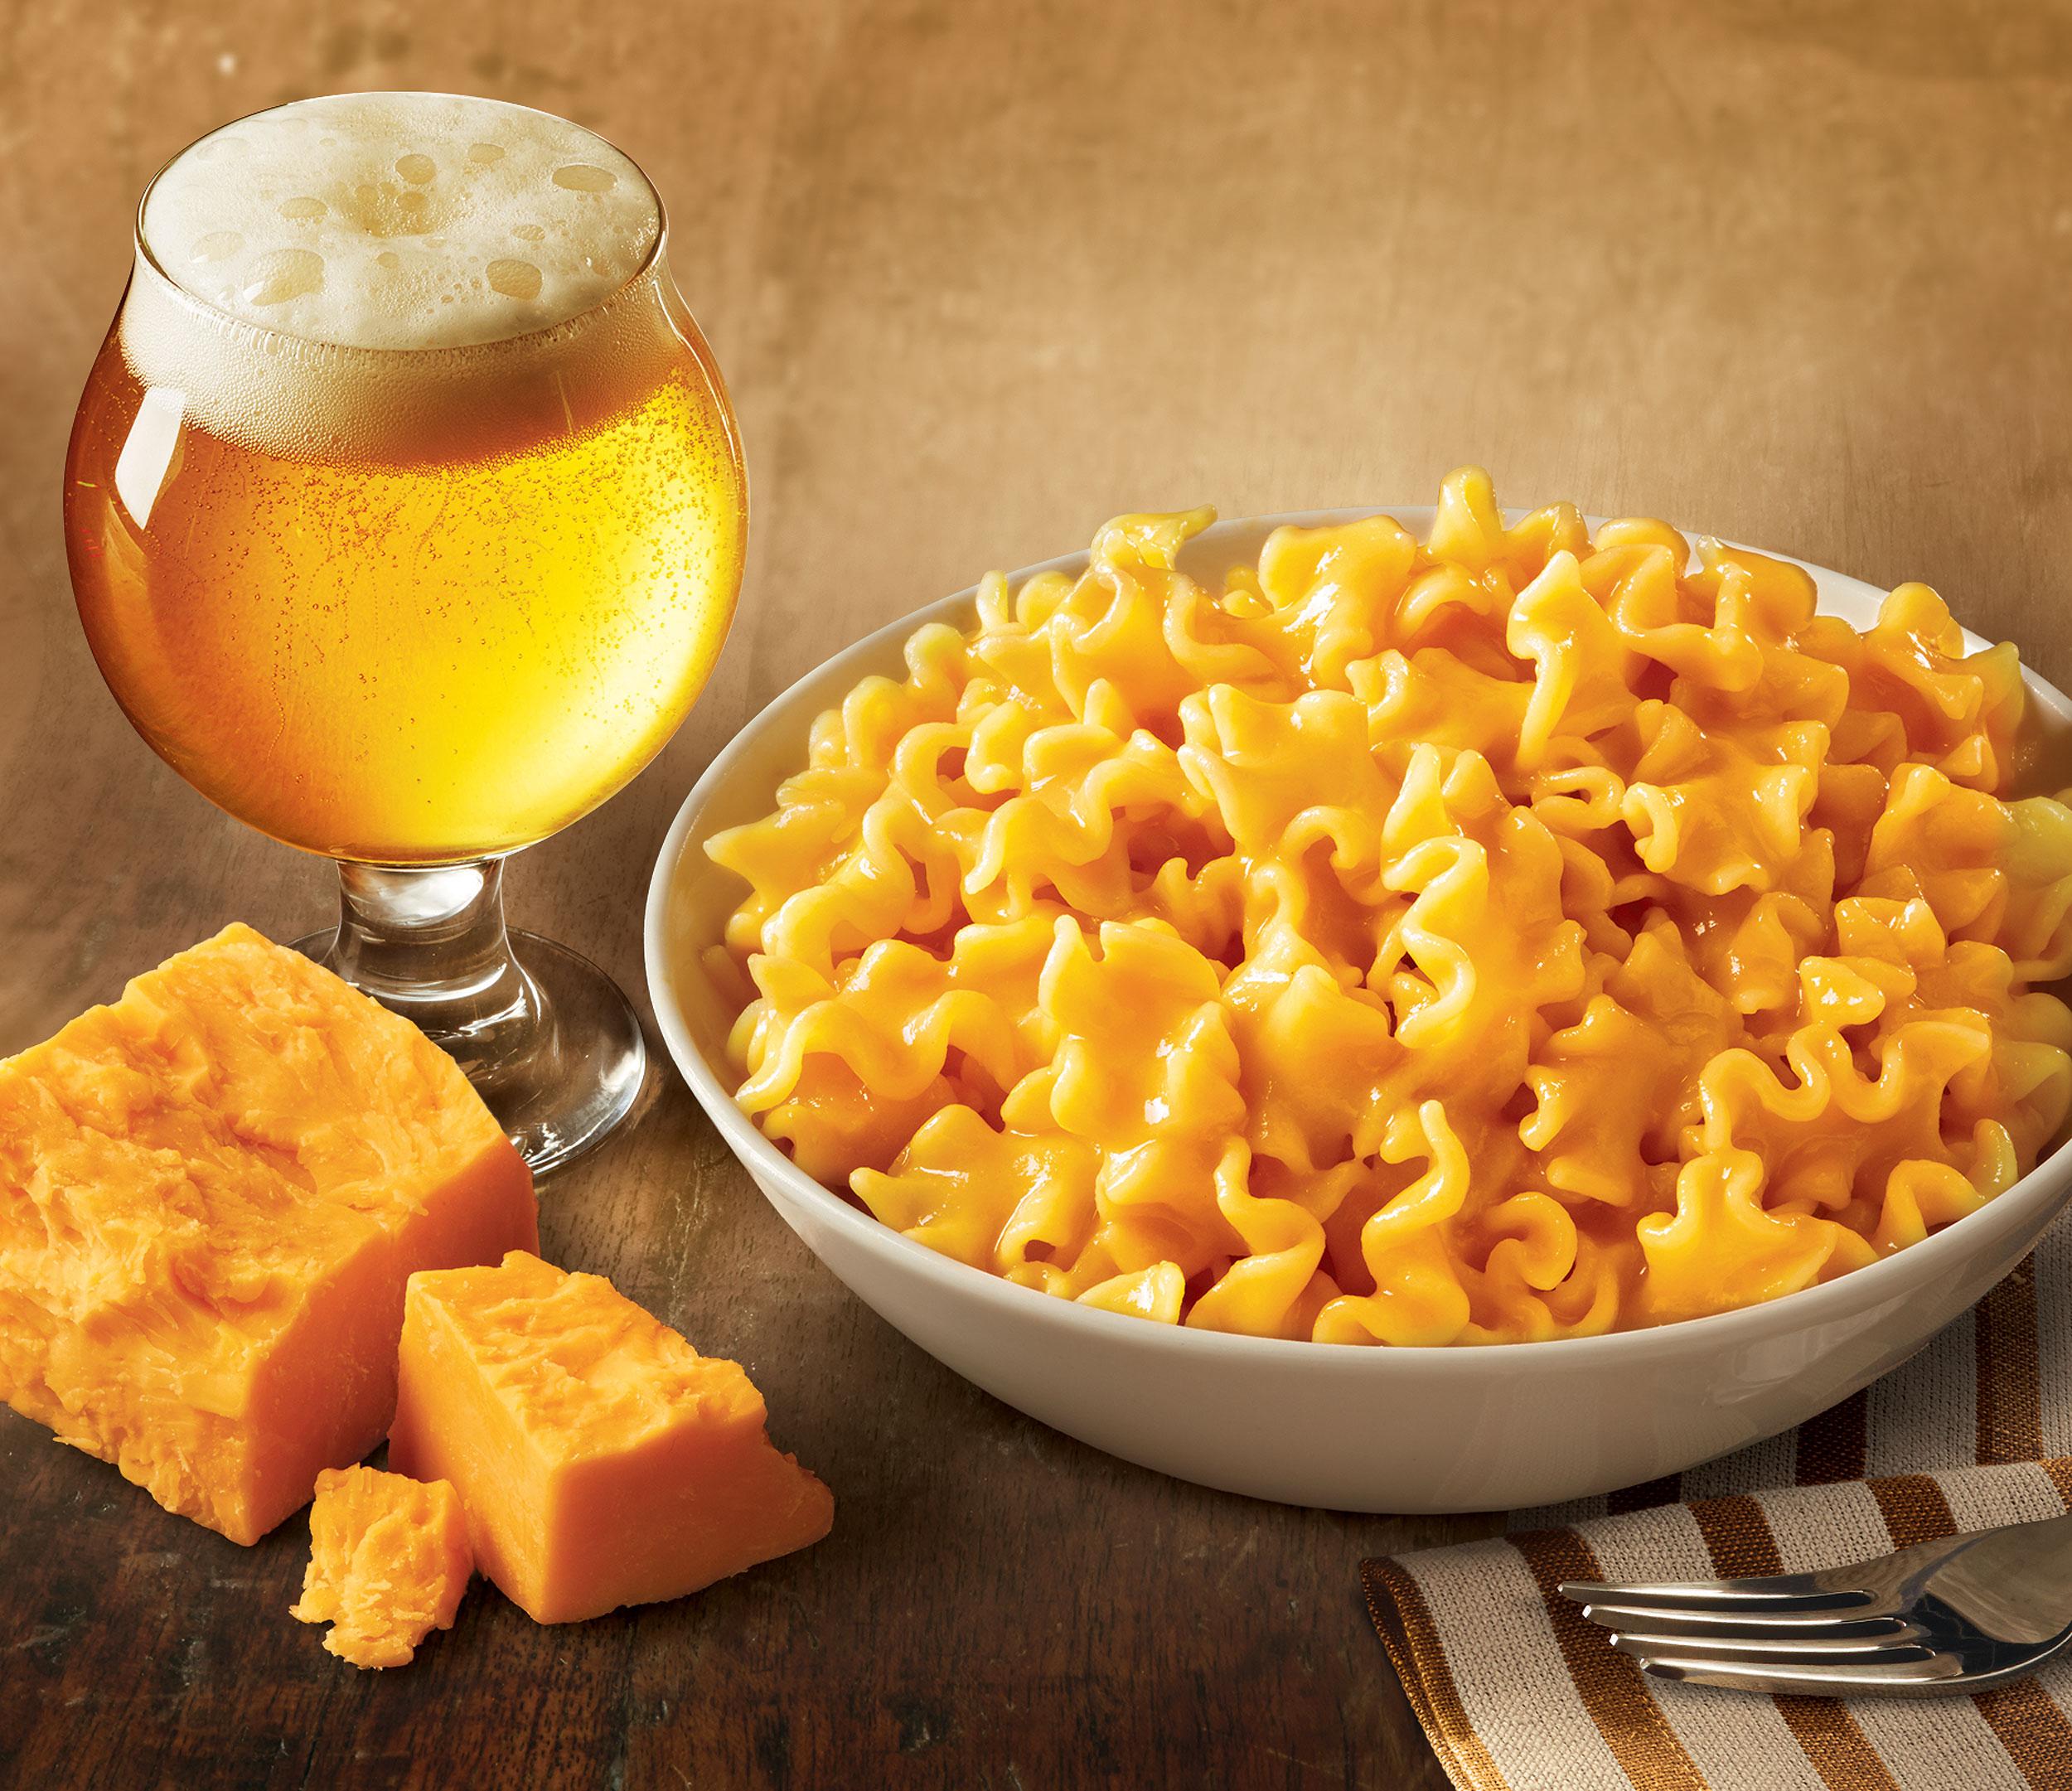 Bear Creek Beer & Cheddar Mac & Cheese